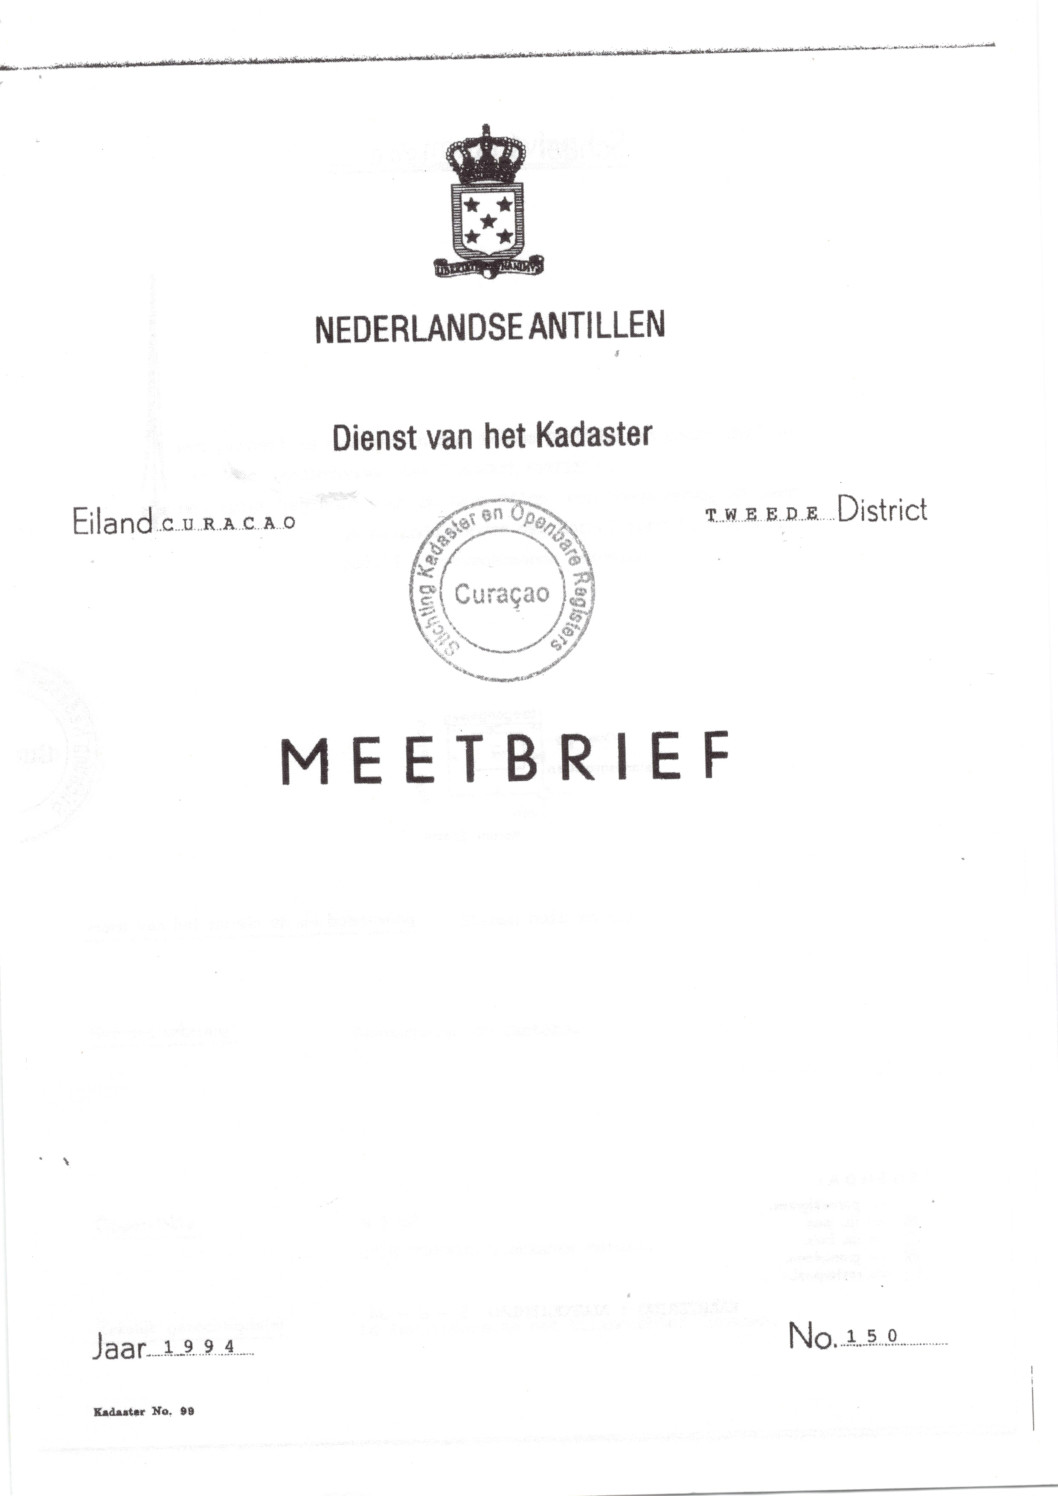 Kaya Pilon 17 meetbrief 150:1994